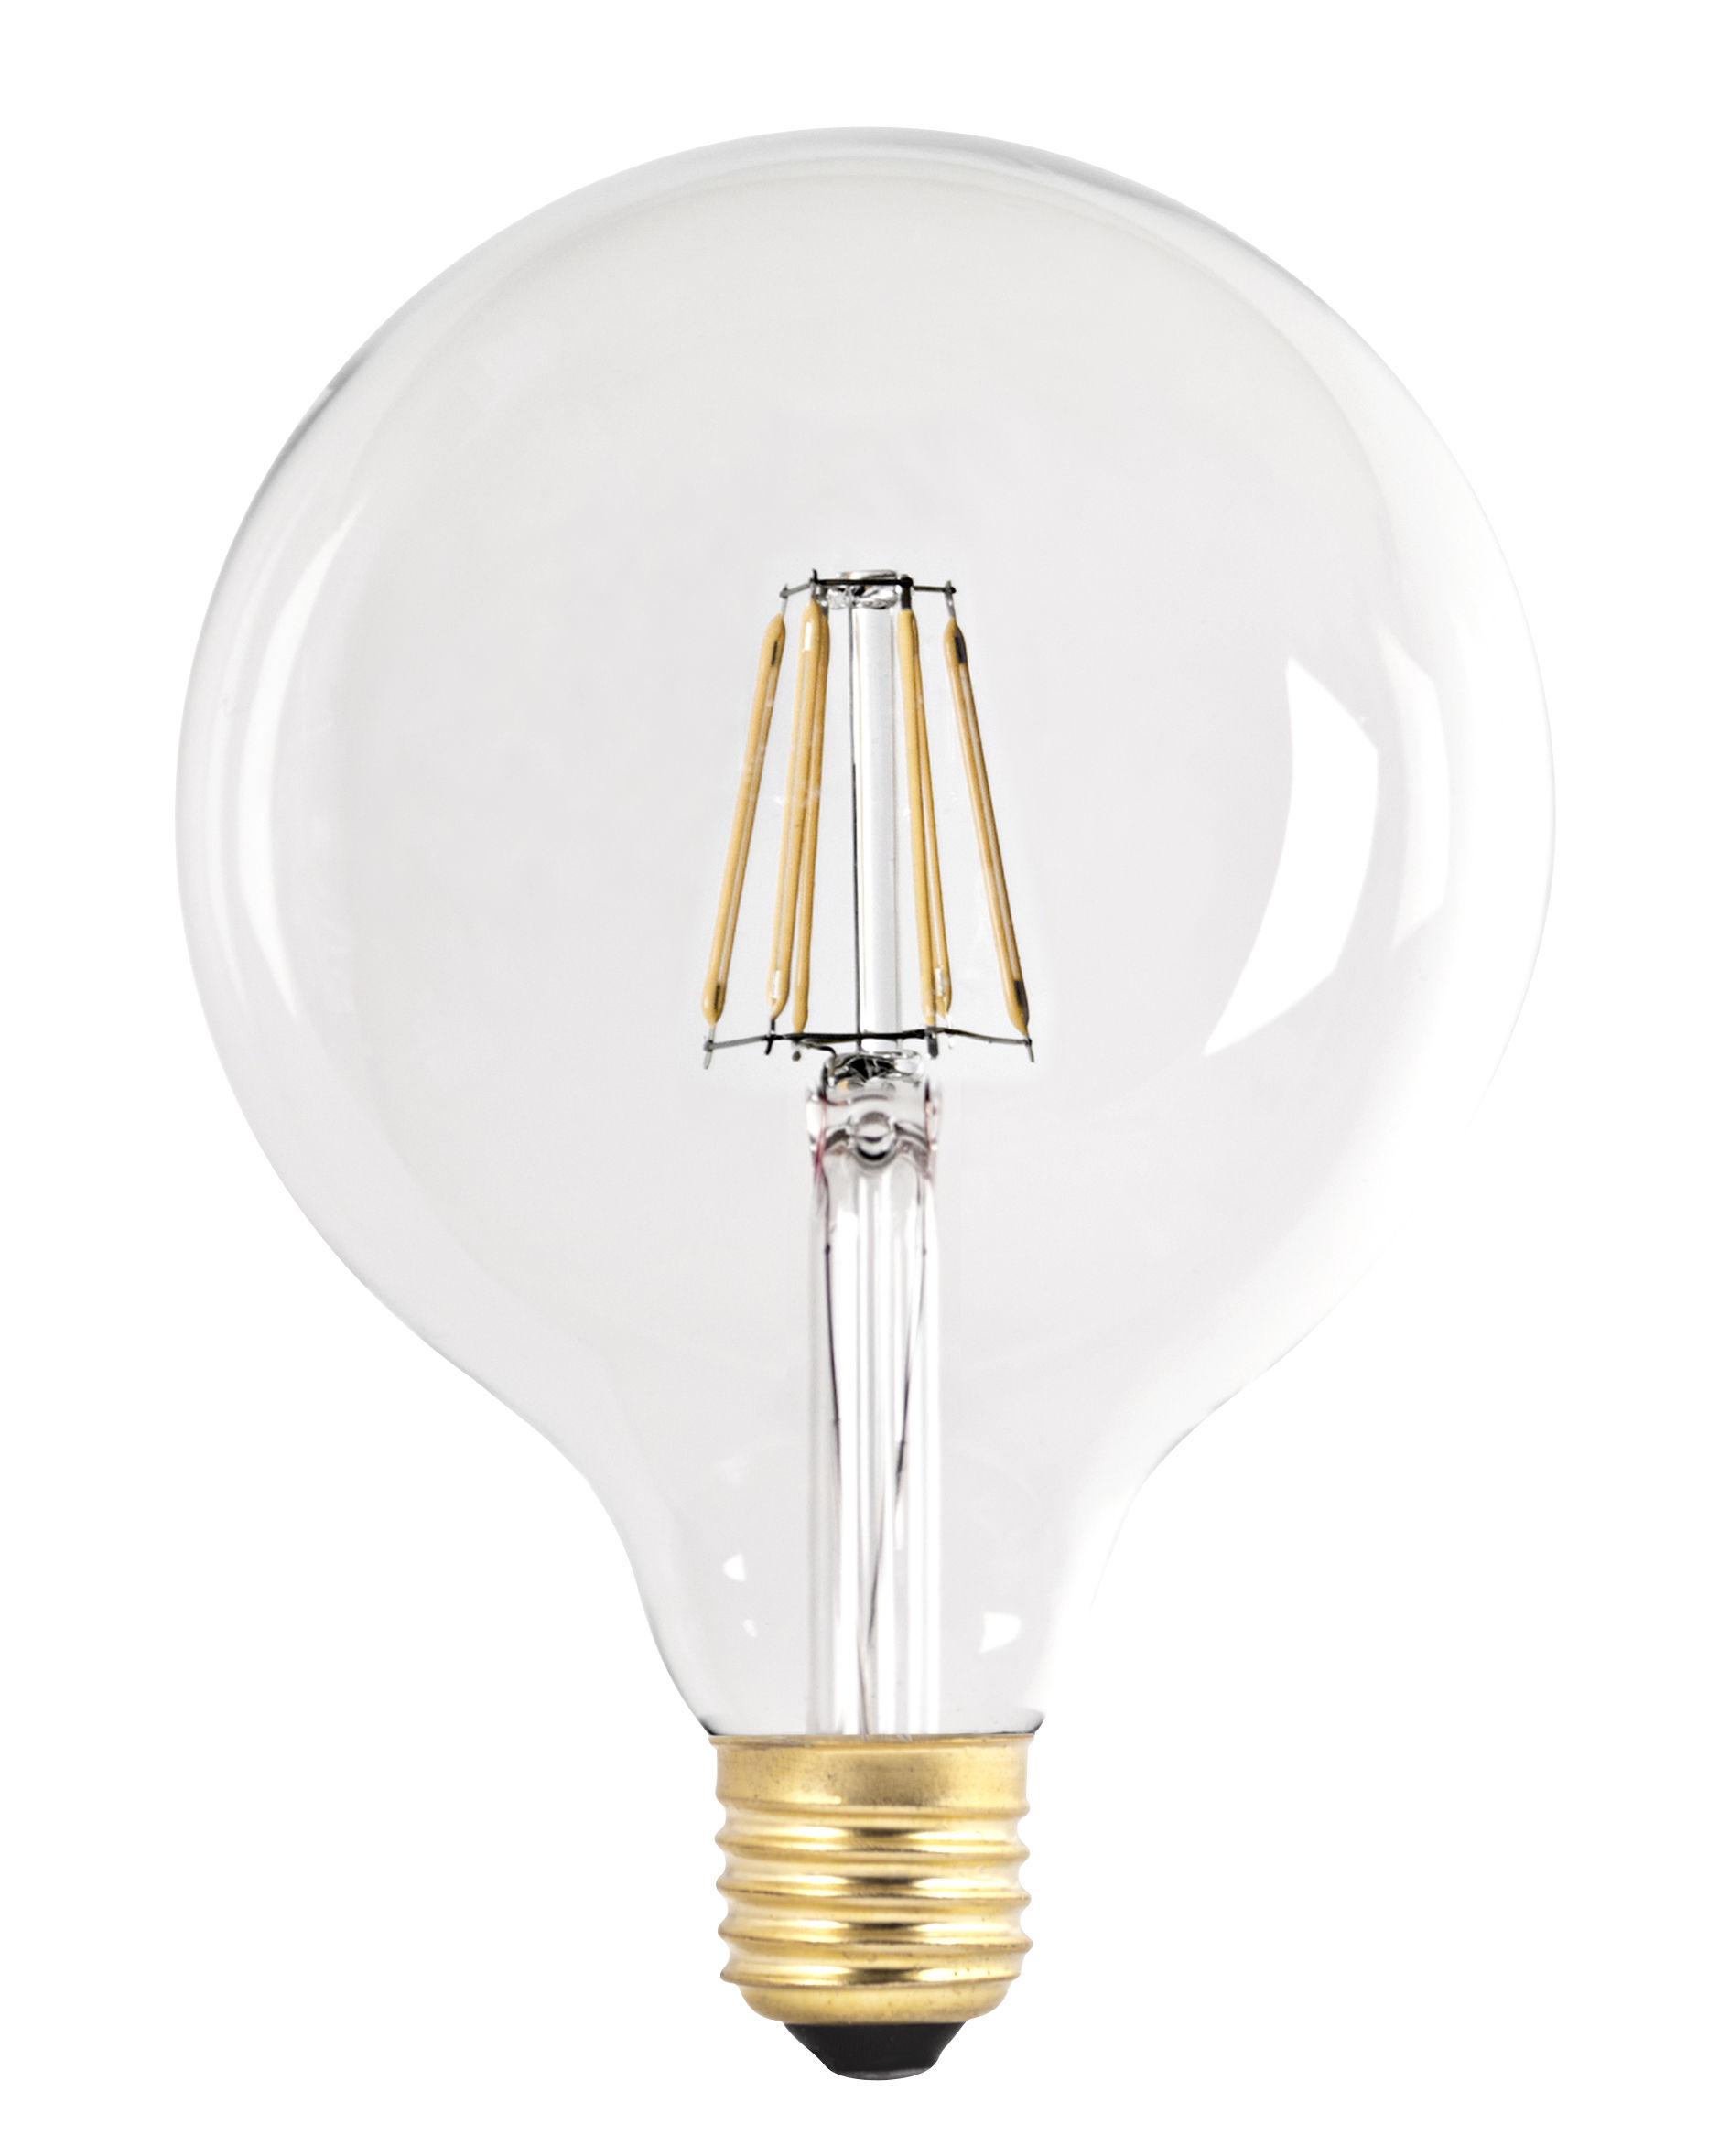 ampoule led filaments e27 g125 6w 60w transparent or pop corn. Black Bedroom Furniture Sets. Home Design Ideas